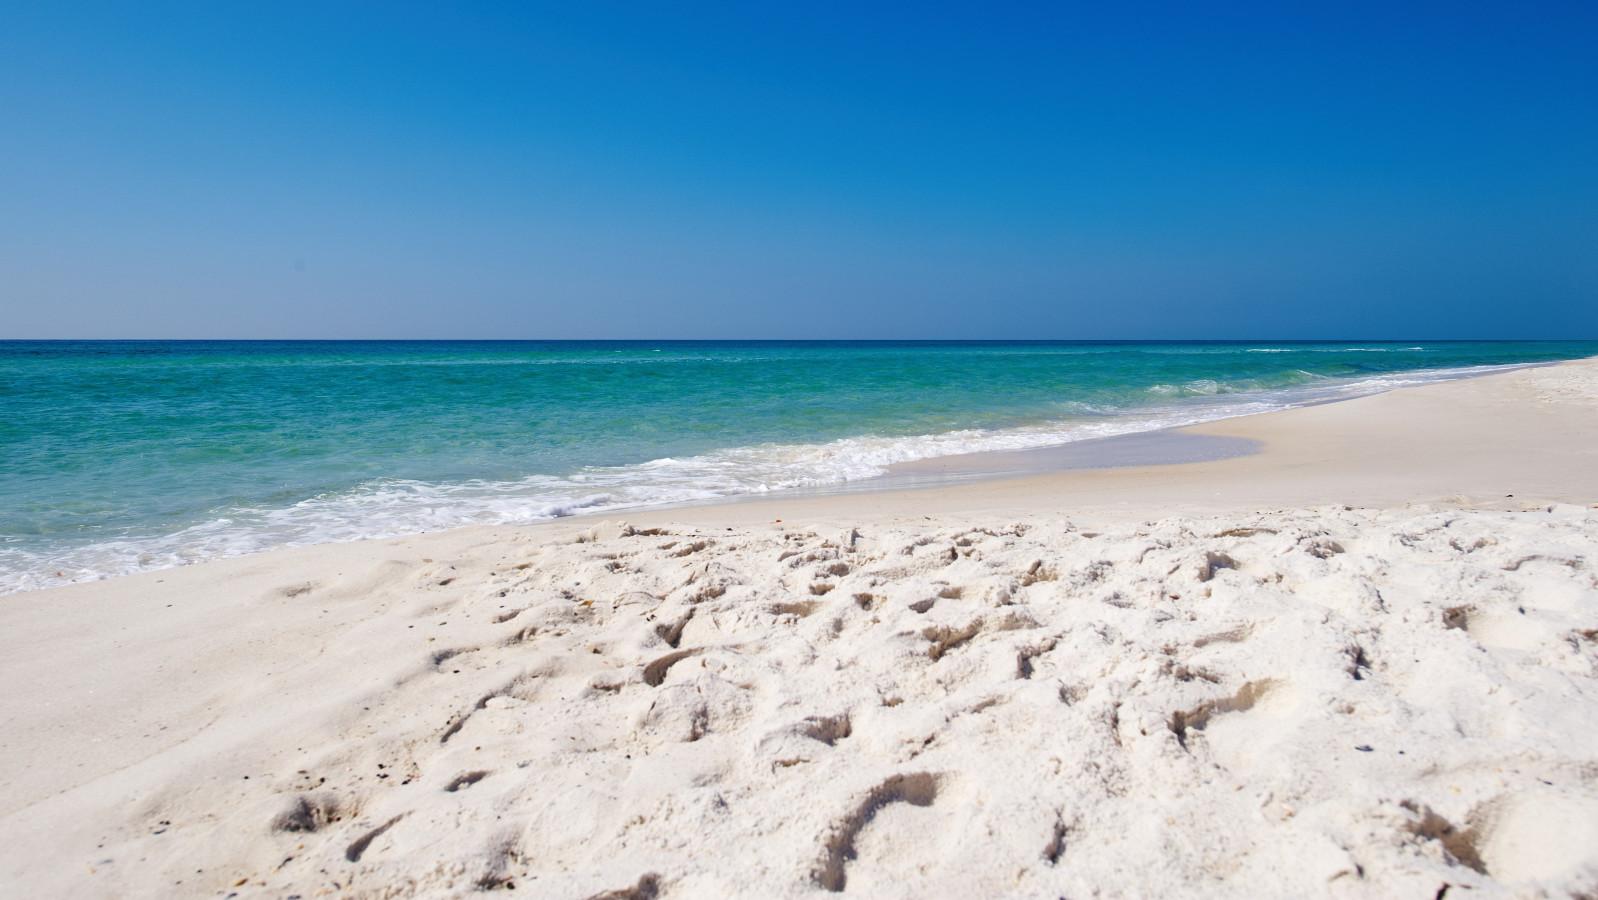 The Beach | The Official Carillon Beach Website